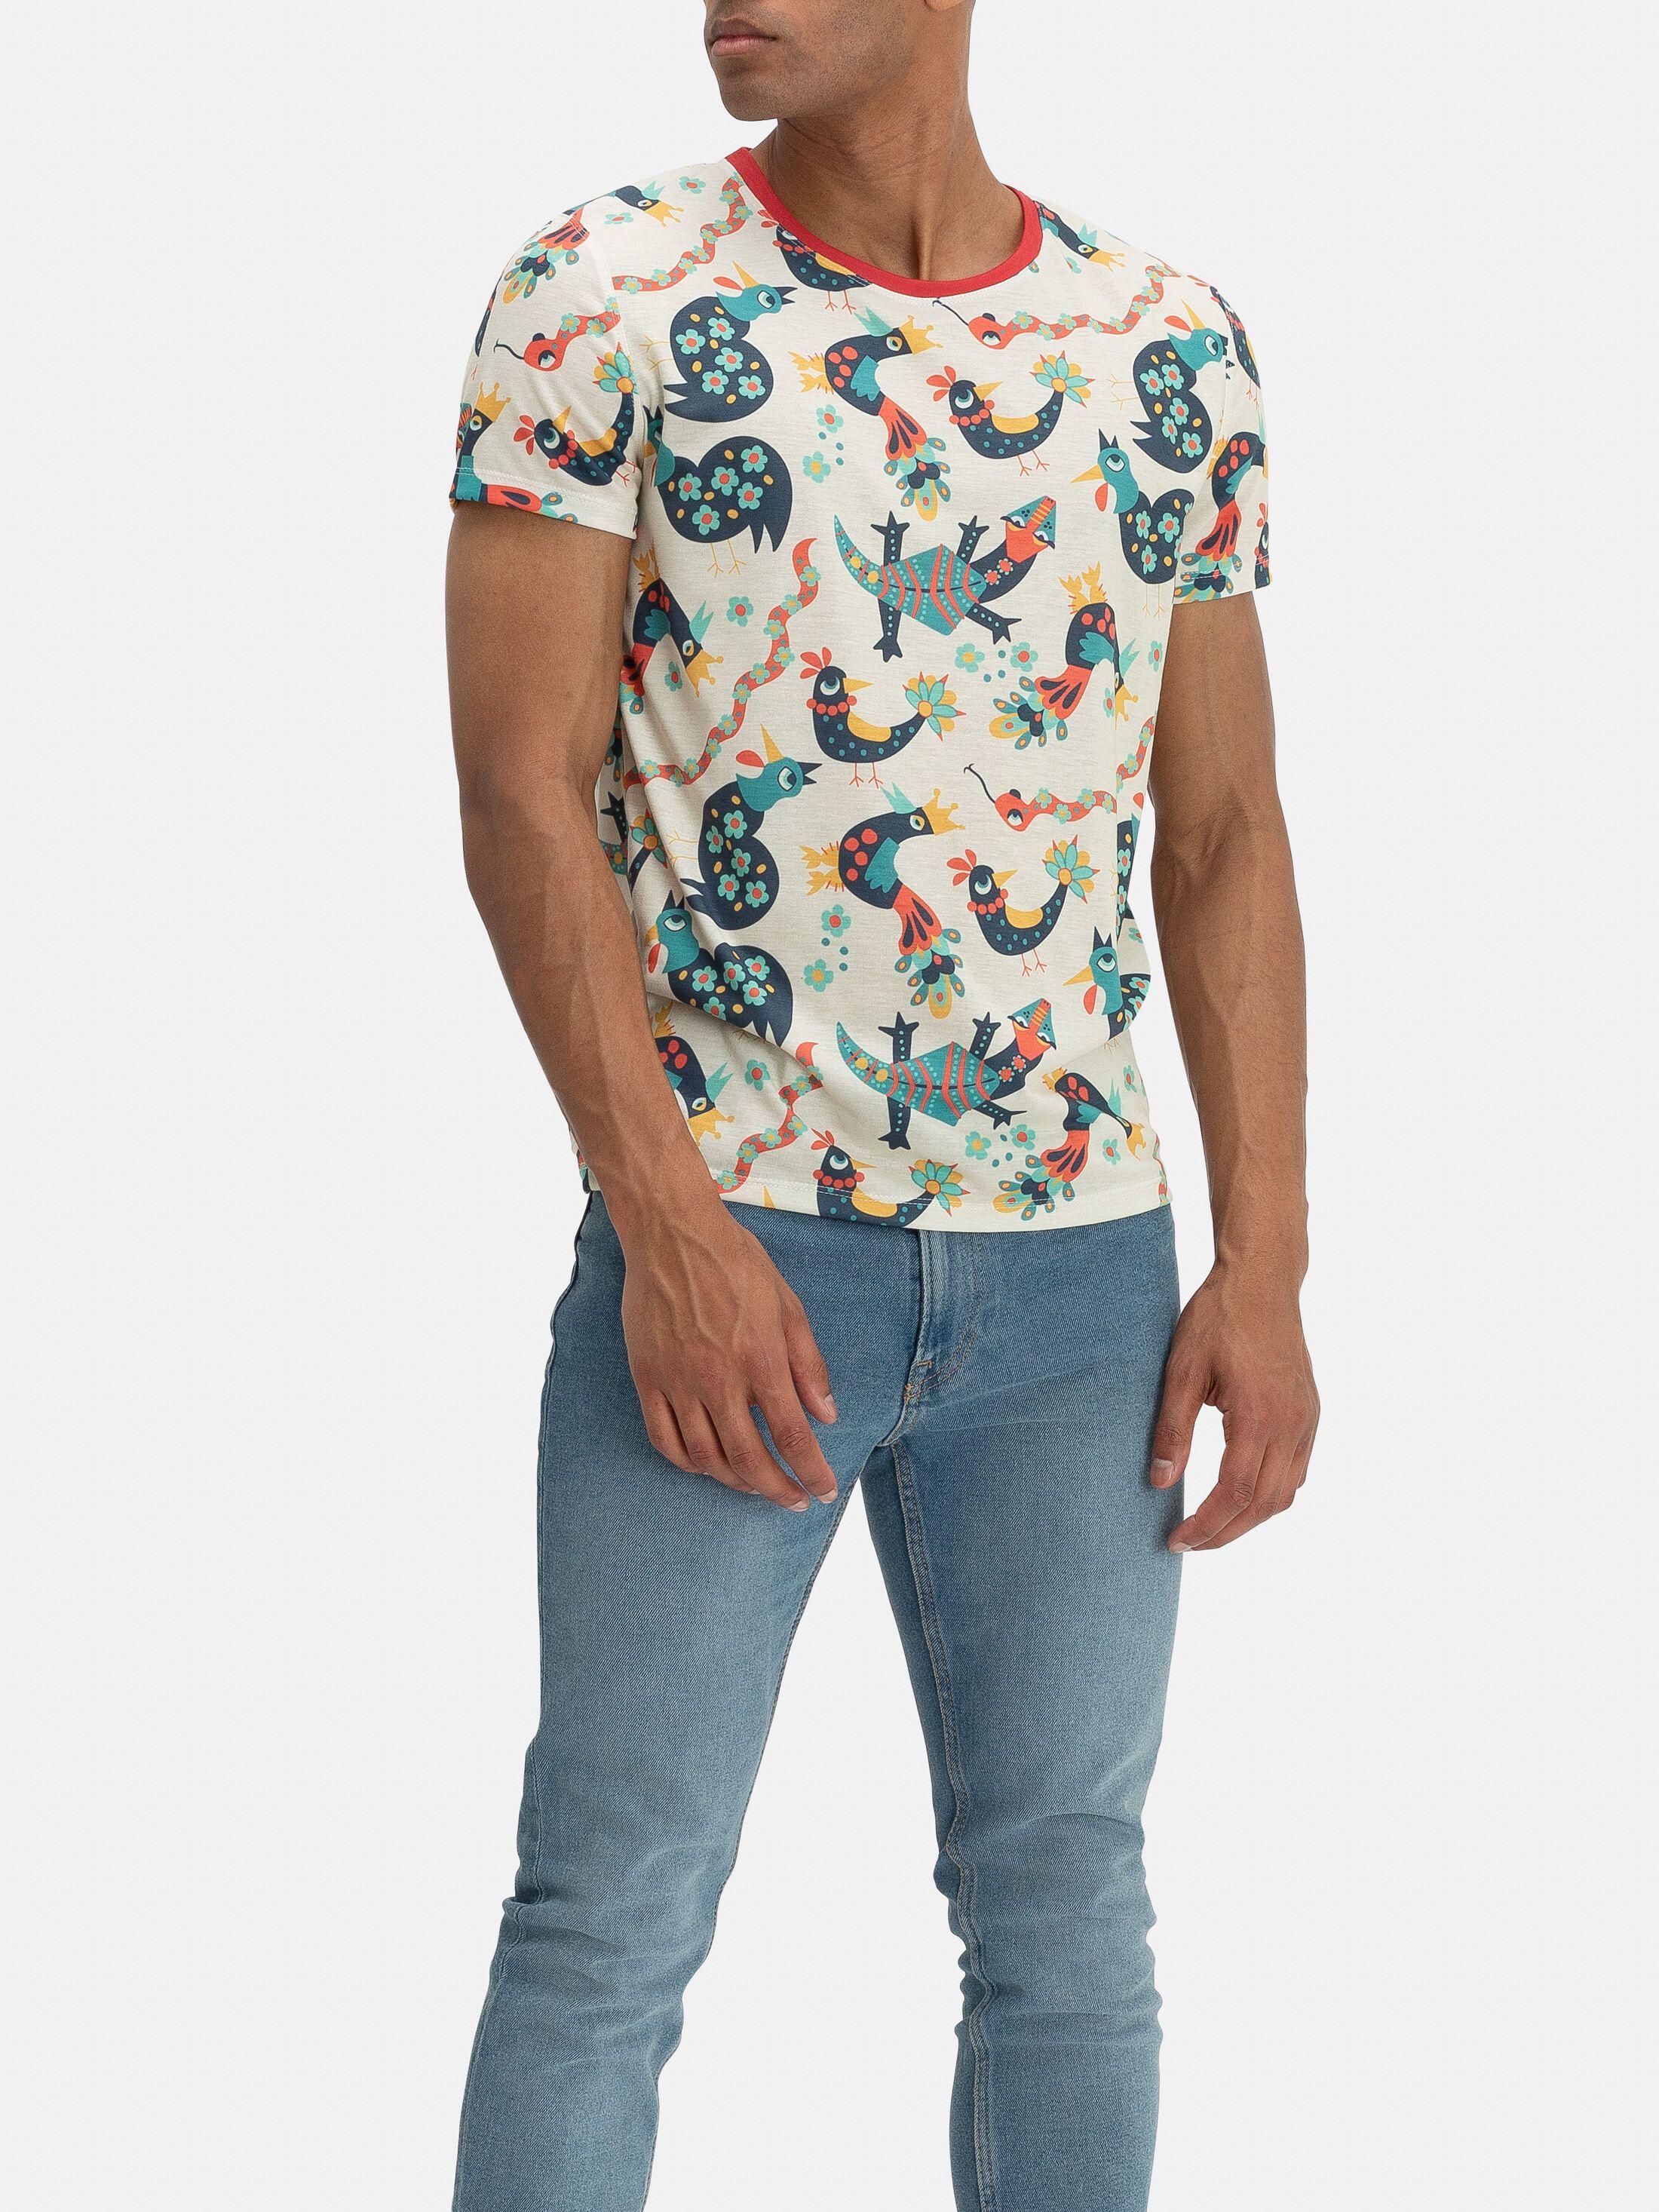 fabricada a mano camiseta personalizada